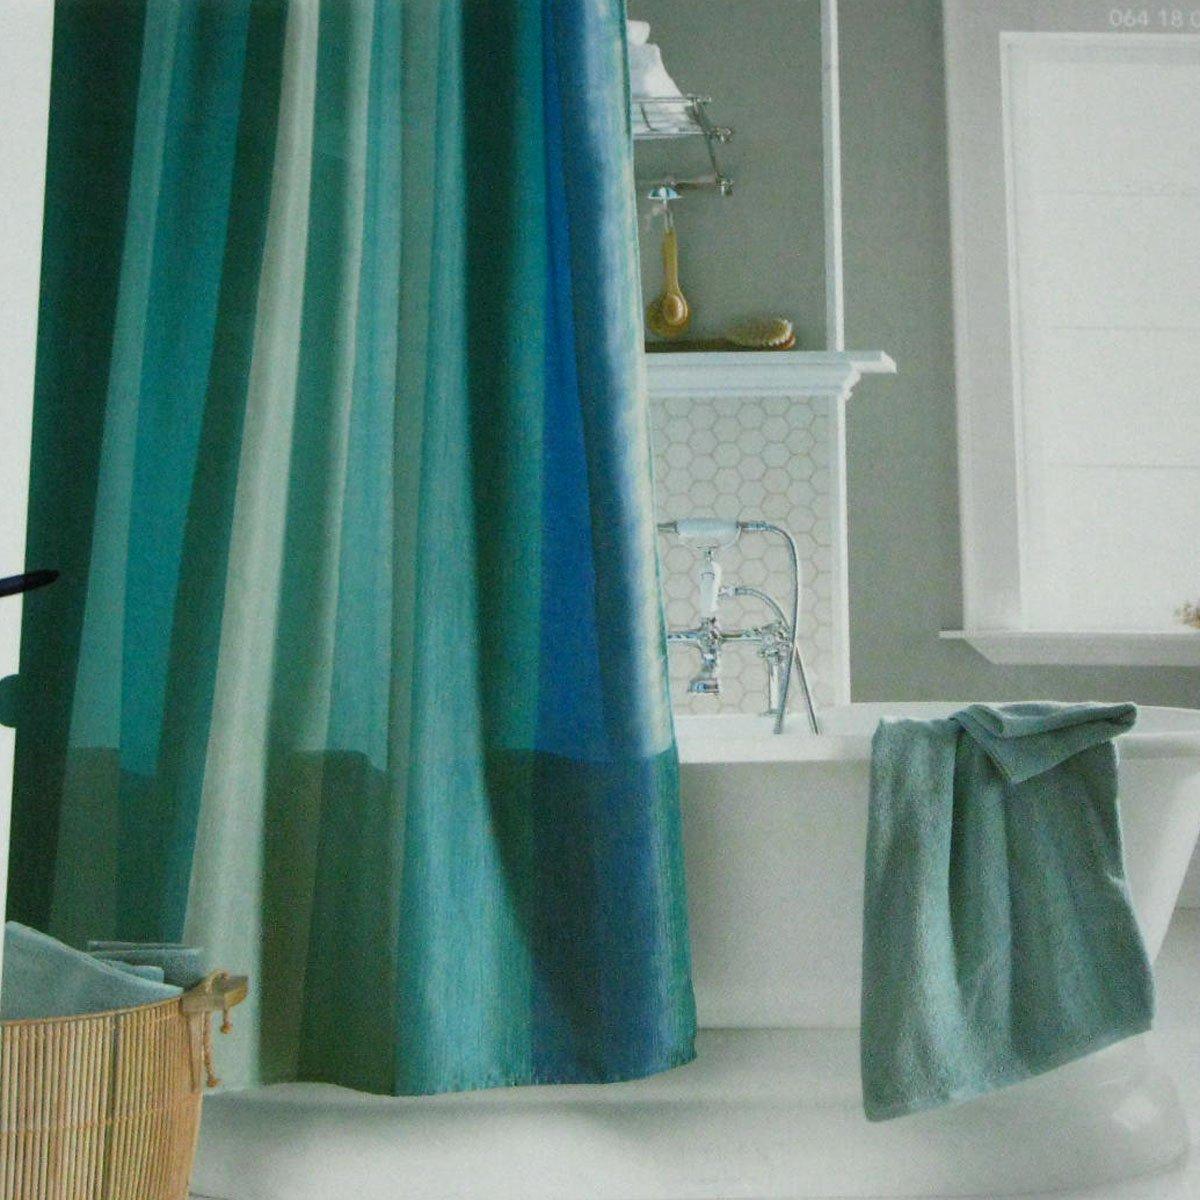 Target AQUAMARINE MULTISTRIPE BLUE Aqua Green Fabric